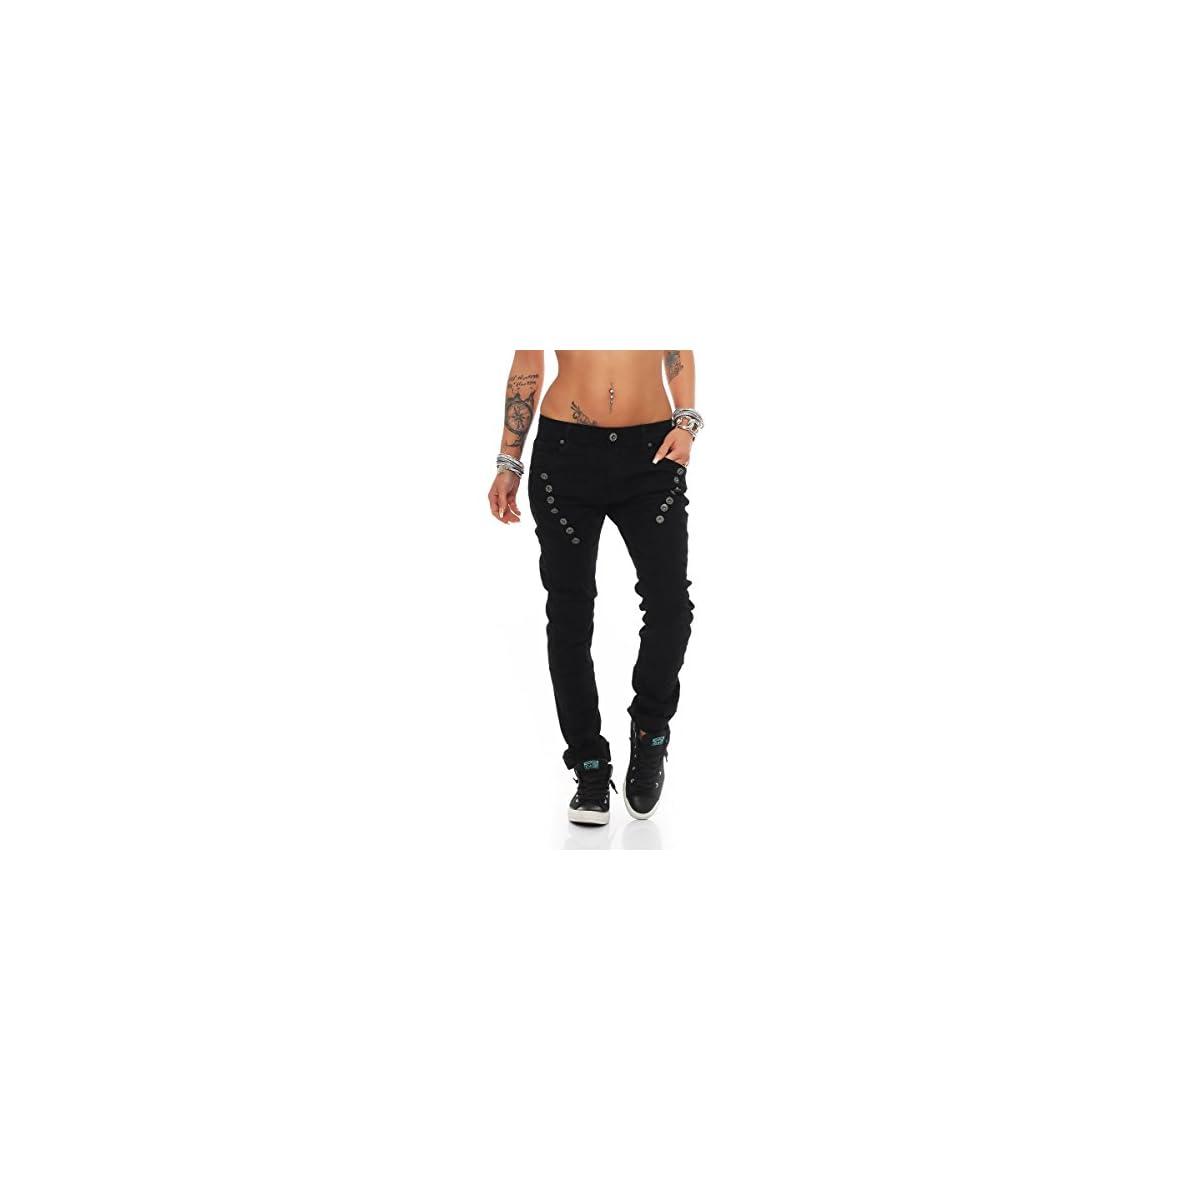 Fashion4Young 10826 MOZZAAR Damen Jeans Jeans 40 Schwarz